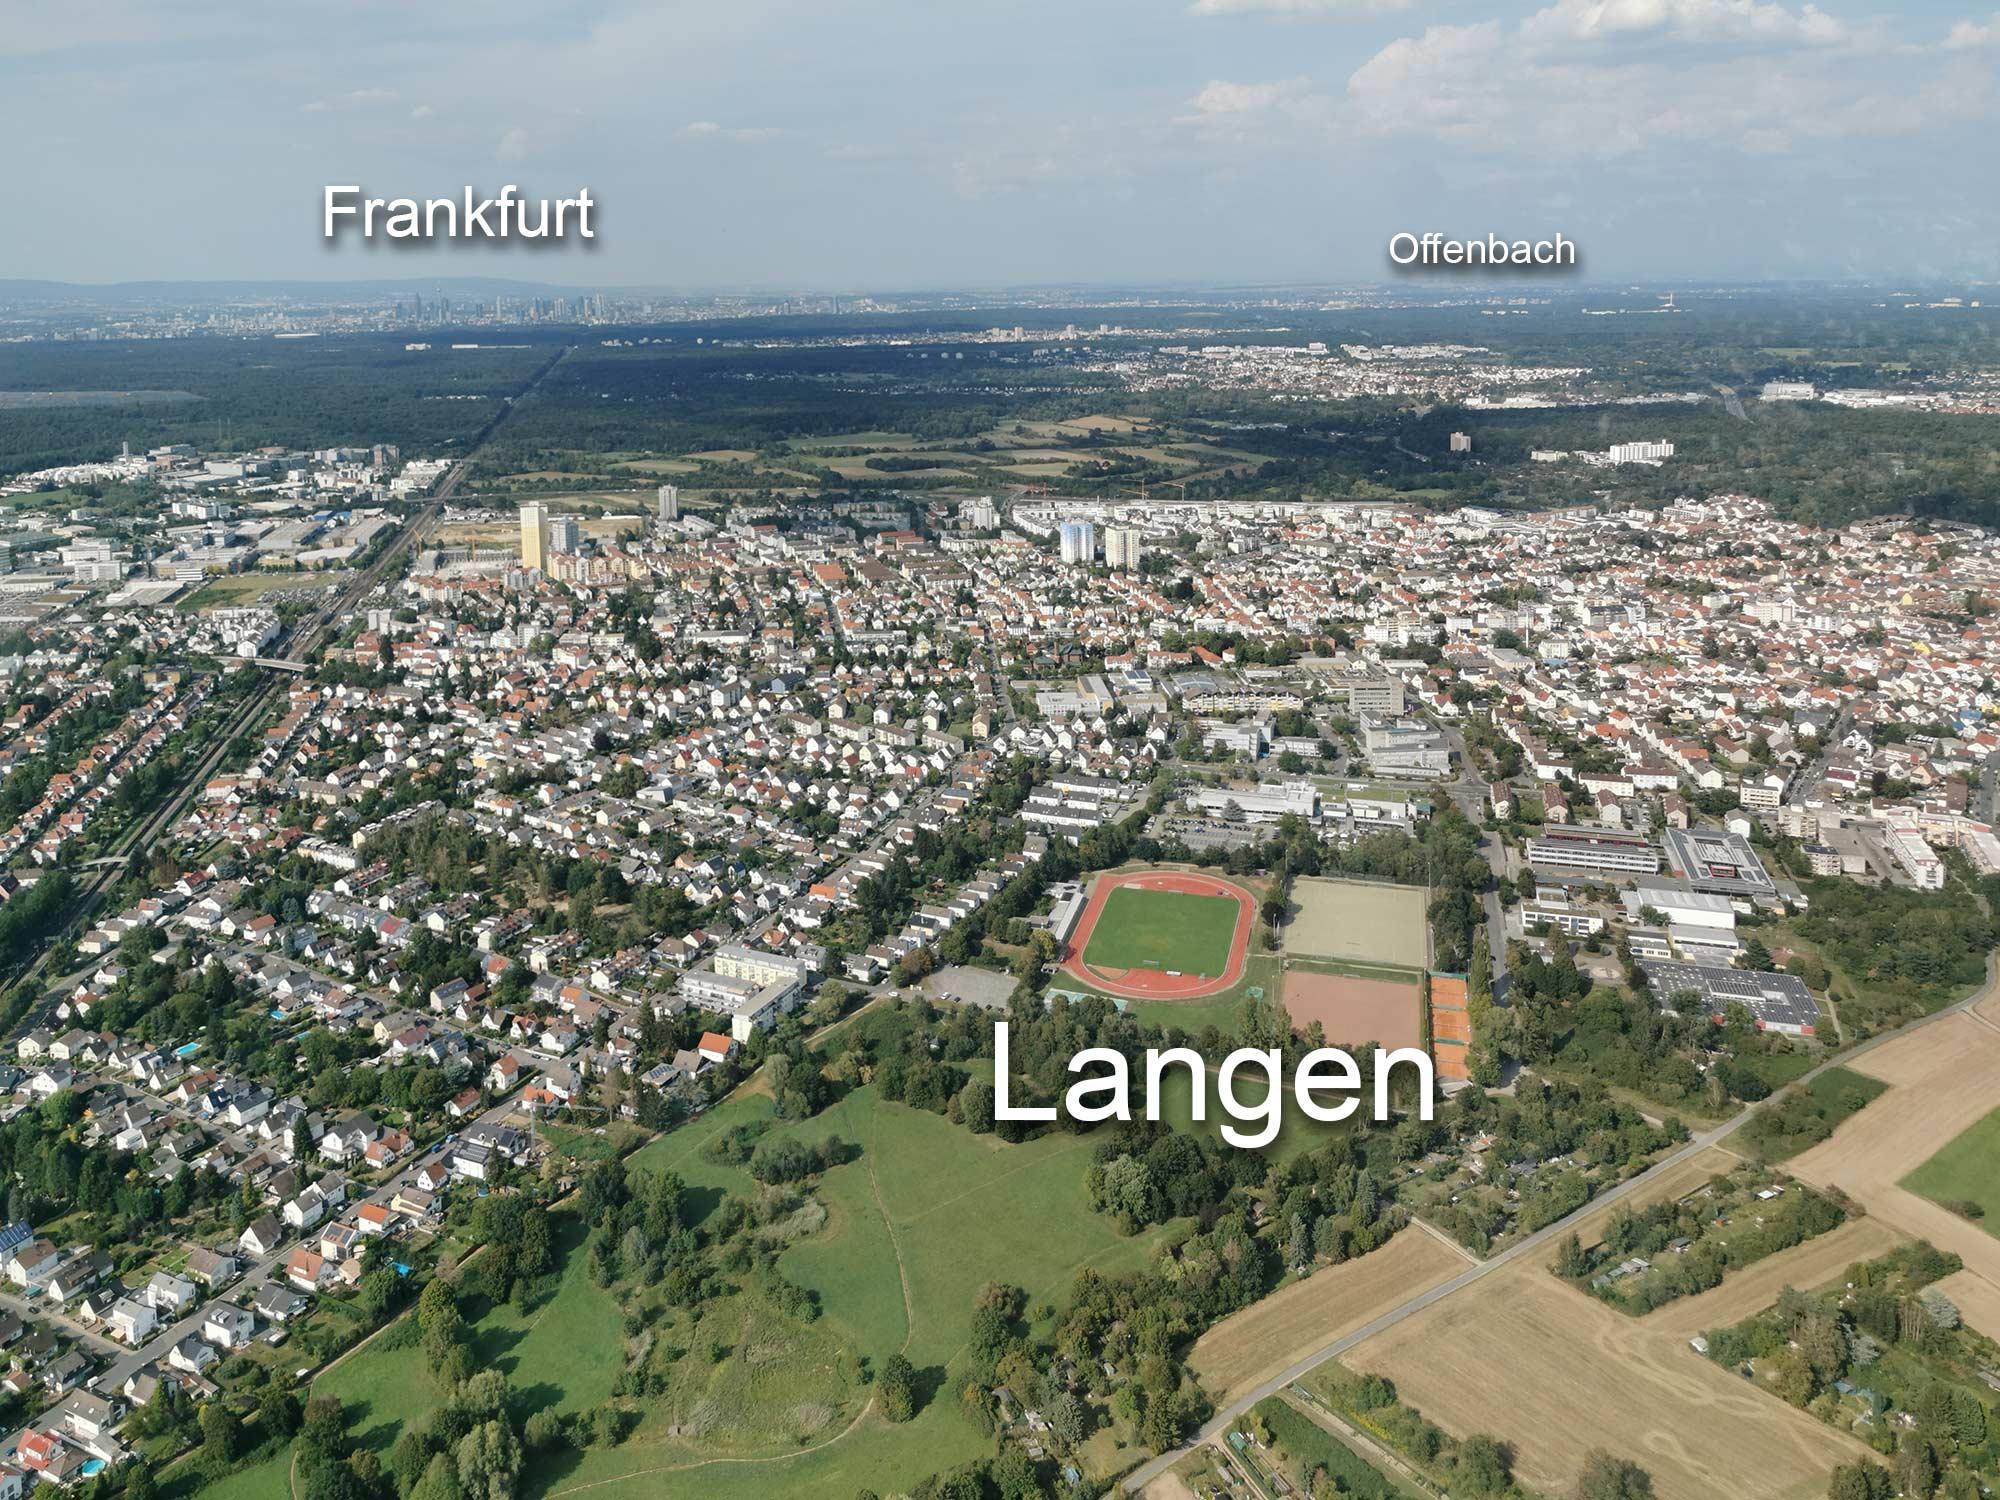 RheinMain area from above - Langen, Frankfurt, Offenbach - helicopter flight Egelsbach - Frankfurt Skyline Ride